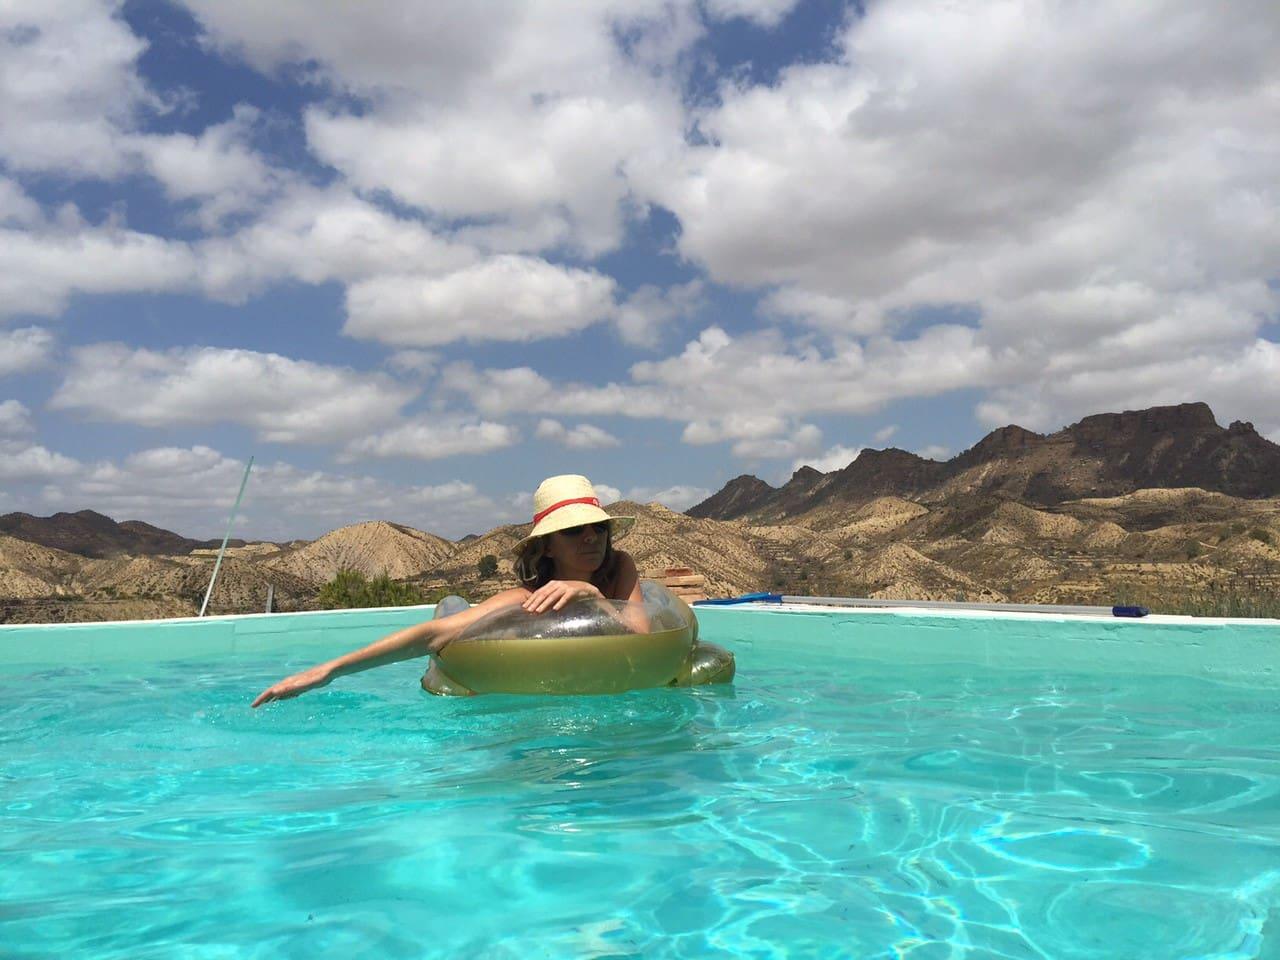 From the pool you will enjoy stunning views. Piscina con maravillosas vistas.